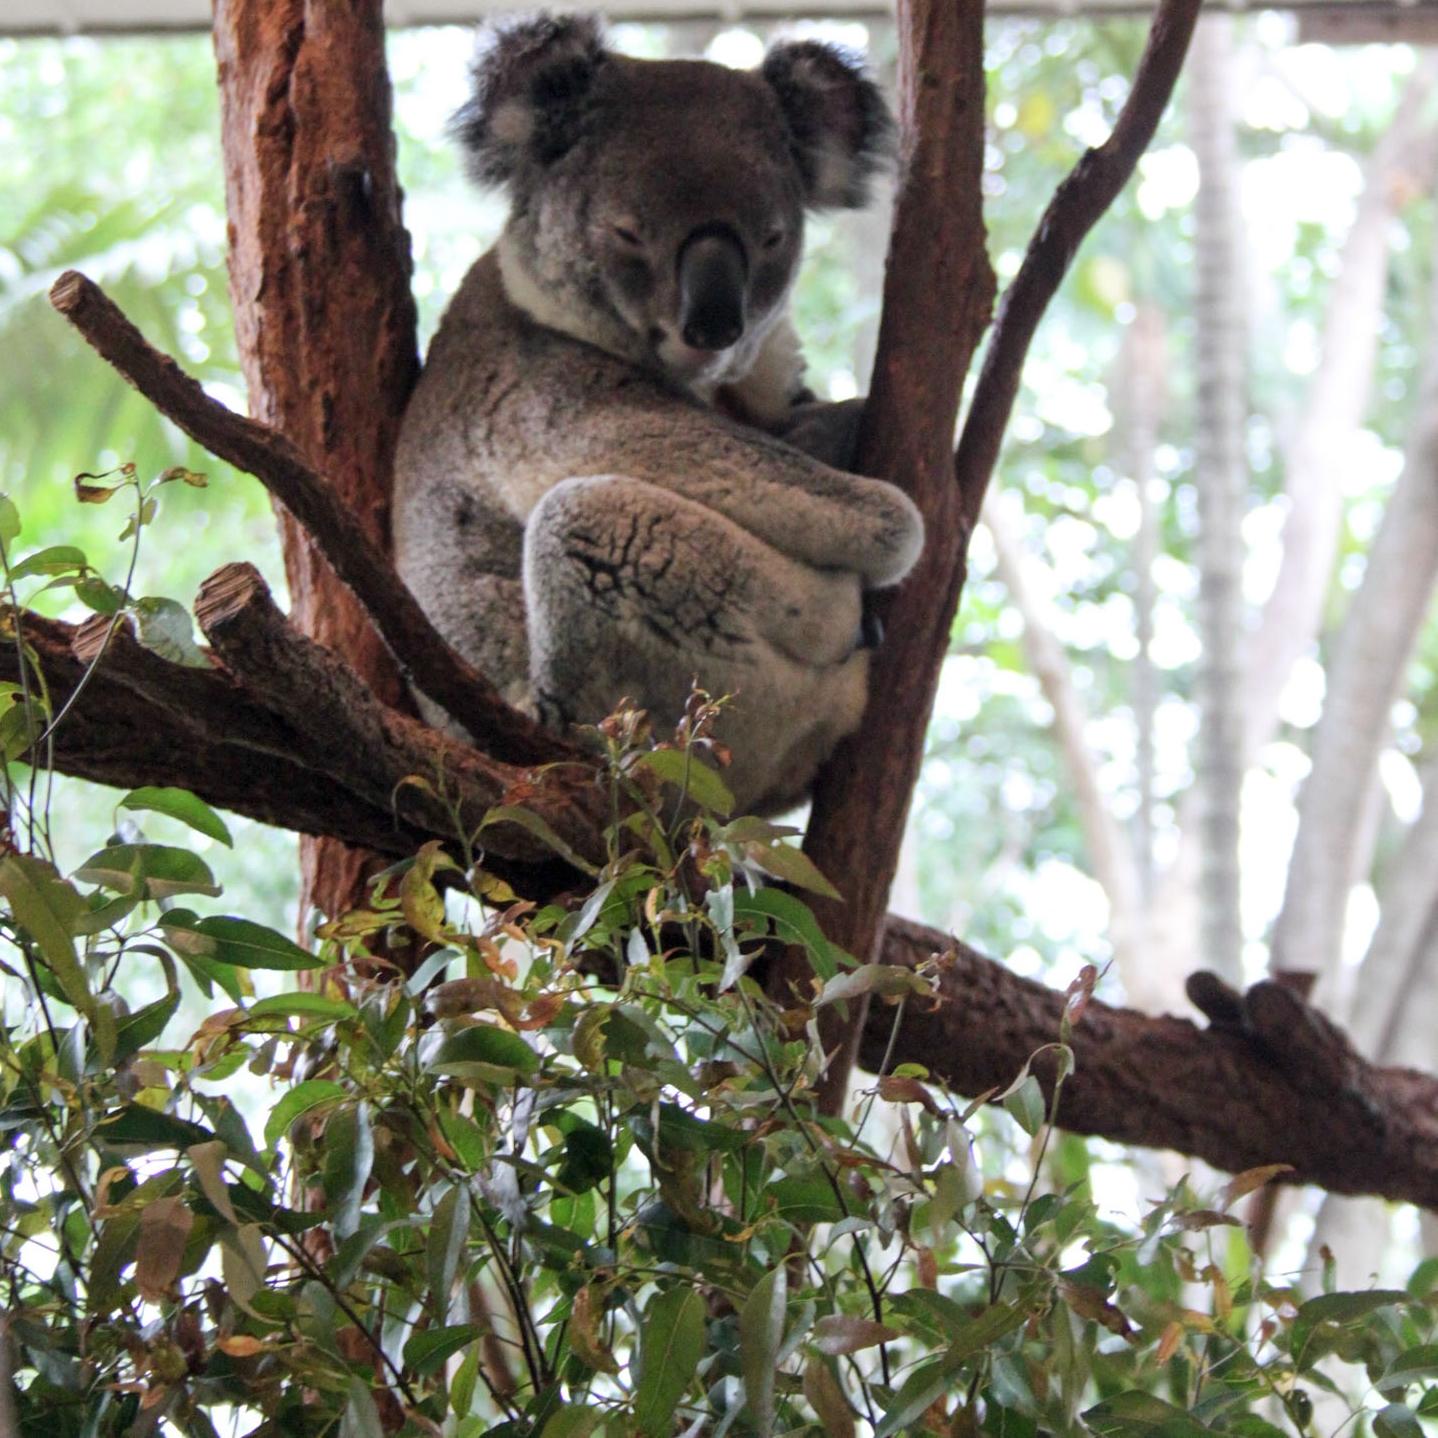 Sleepy Koala at Lone Pine Koala Sanctuary